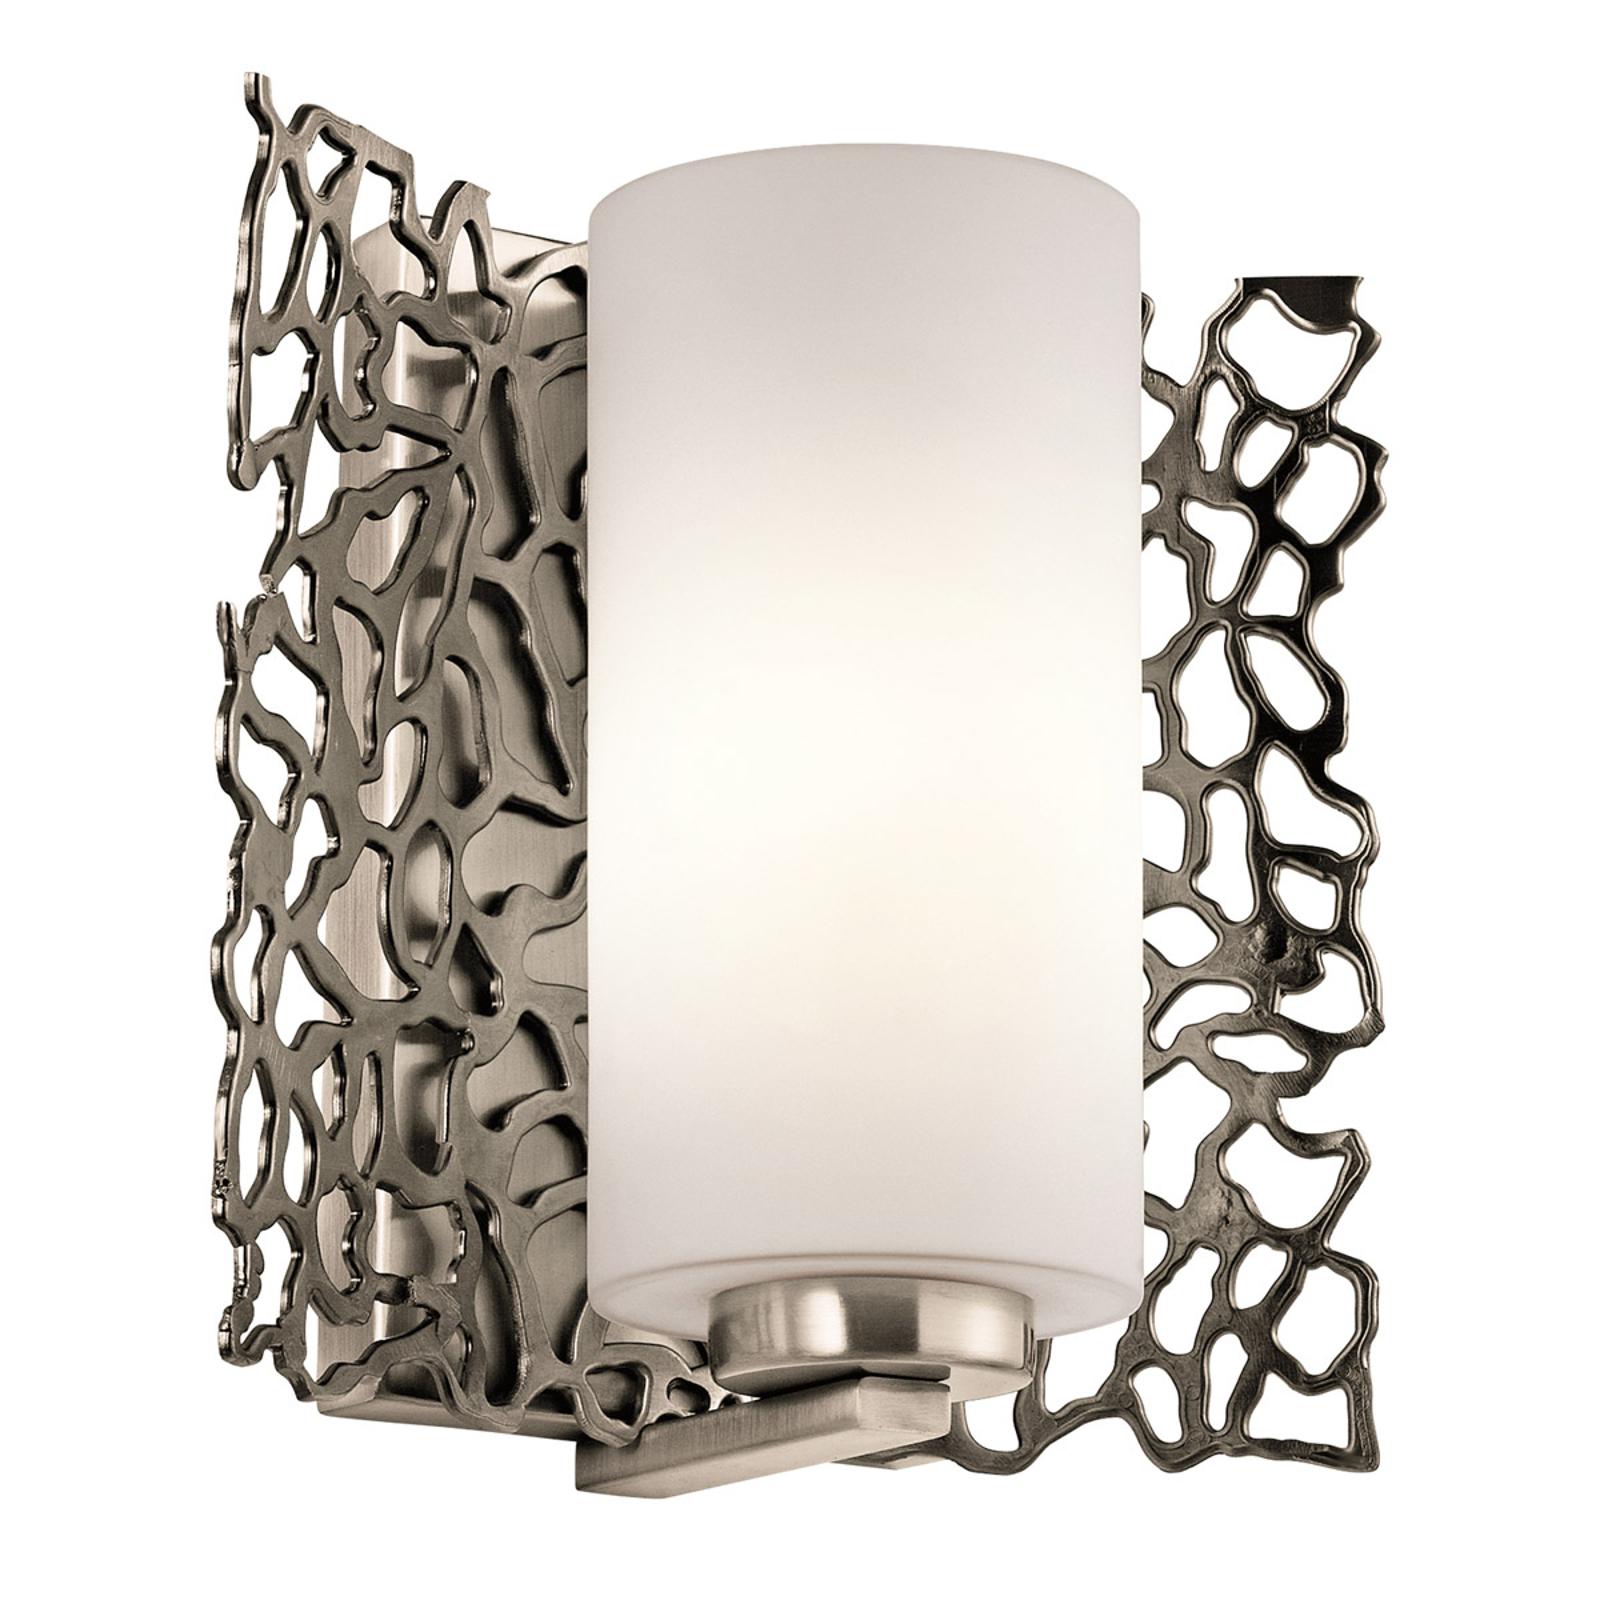 Nástenné svietidlo Silver Coral_3048282_1